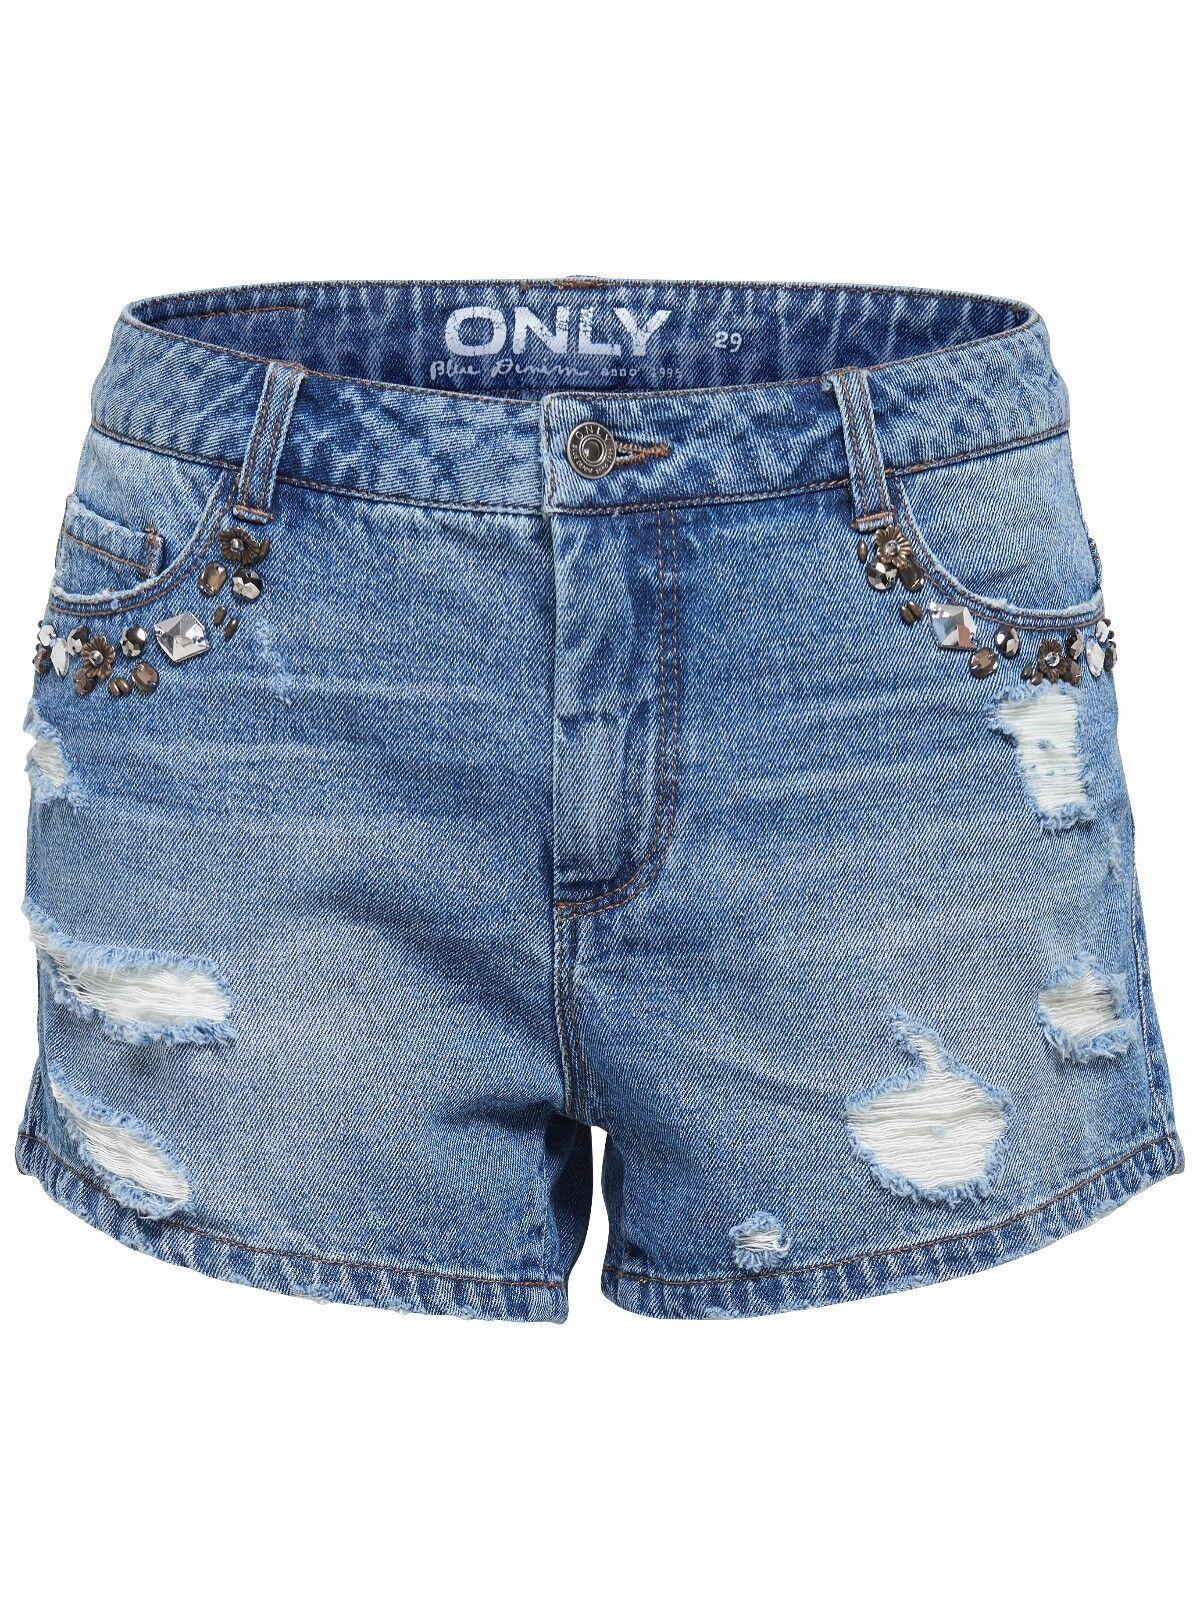 44/8 NEU ONLY Damen Jeans Hose Hotpant onlPACY HW ZOE STUD DNM SHORTS kurz W 29